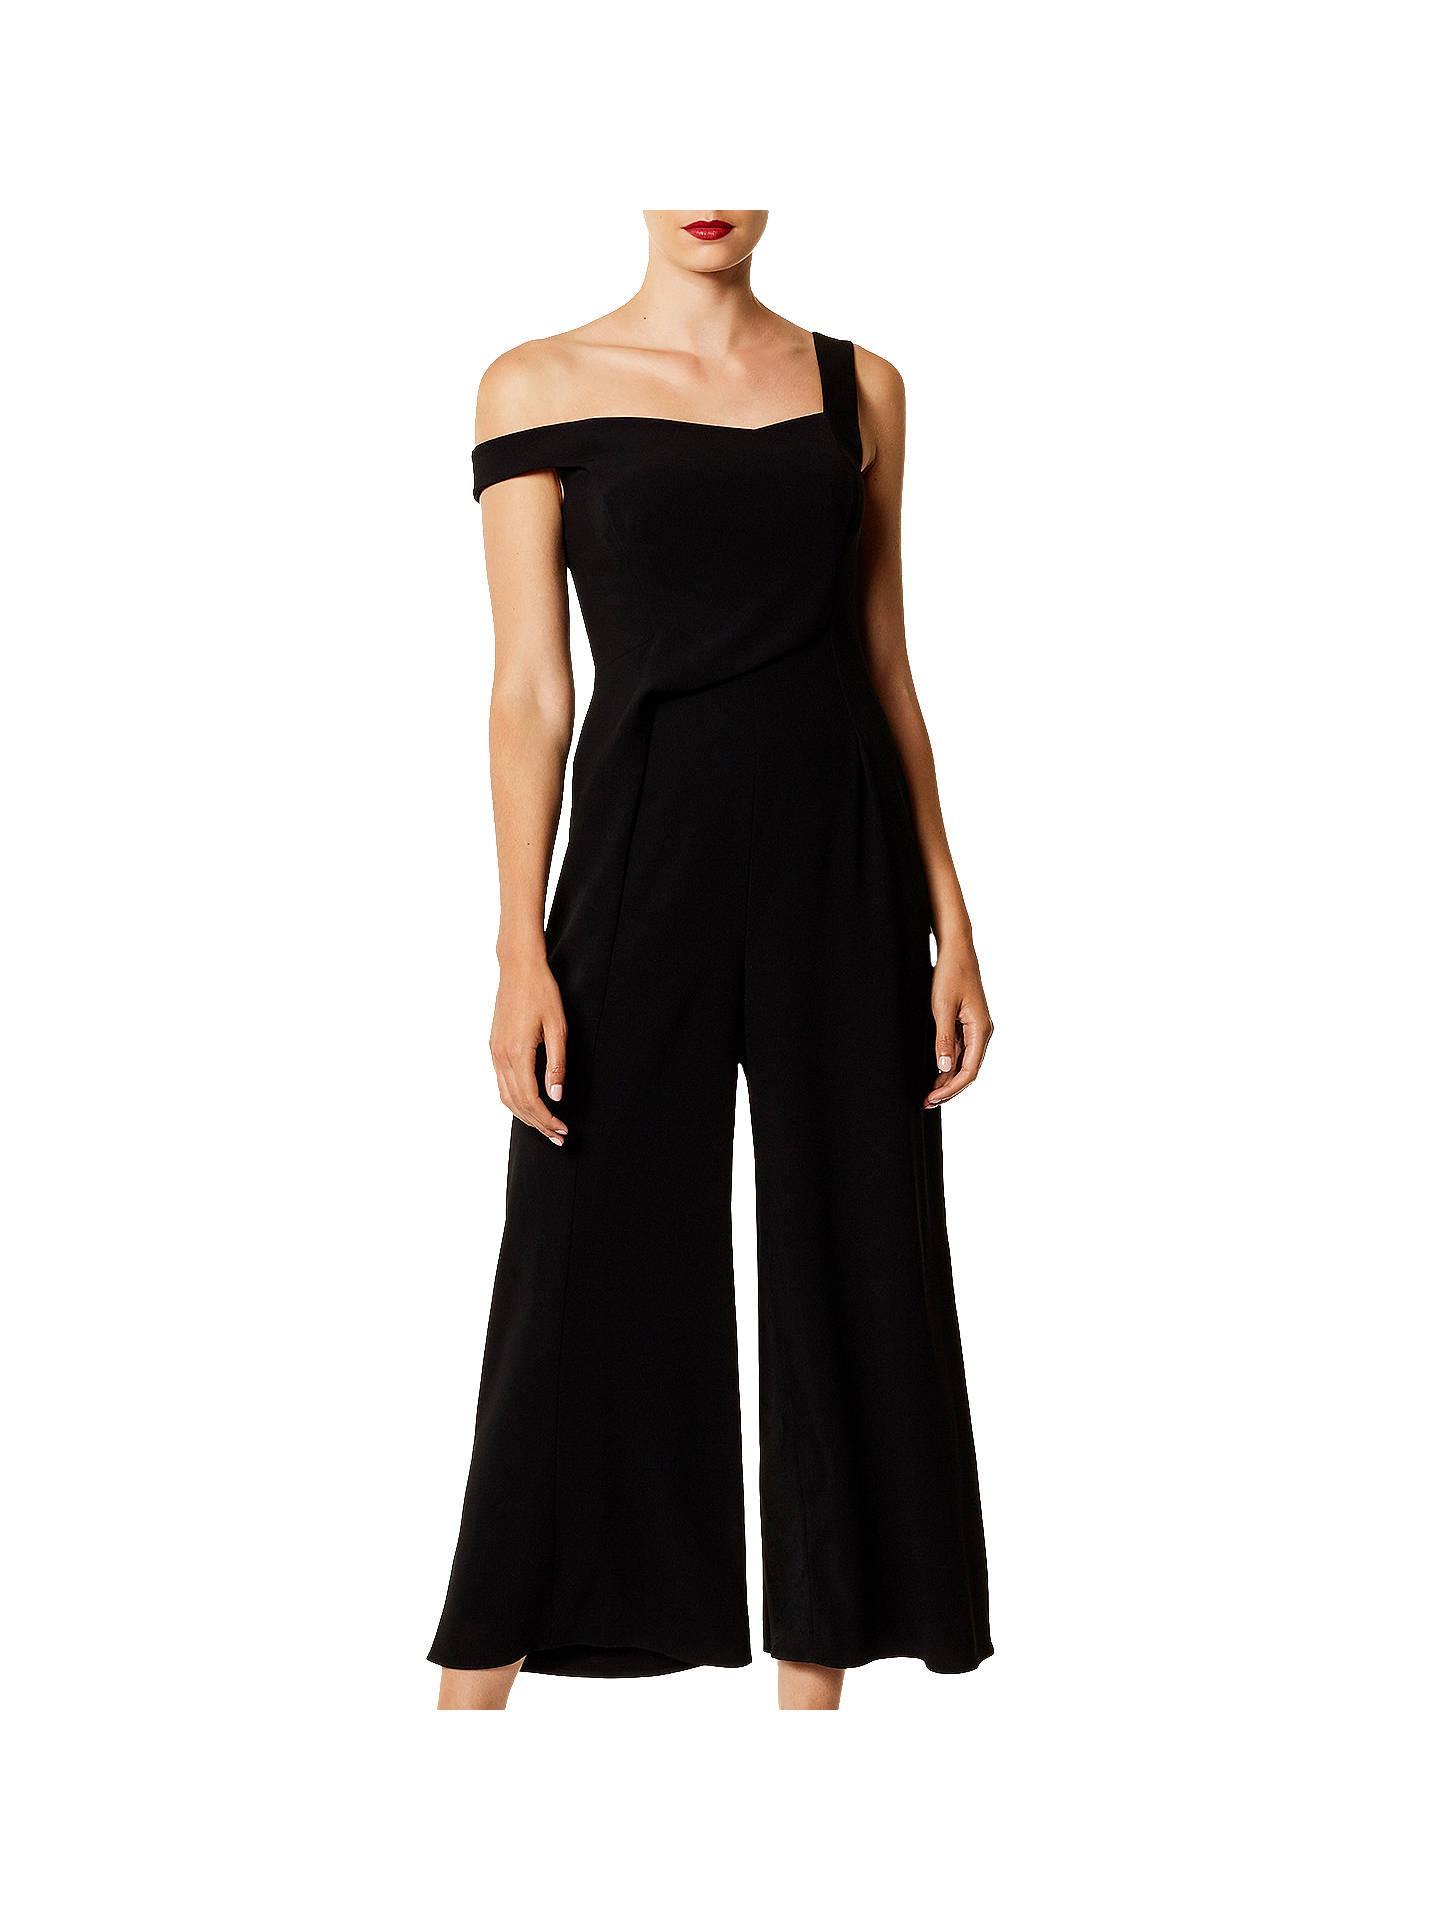 7847b38e7f20 Buy Karen Millen Asymmetric Wide Leg Jumpsuit